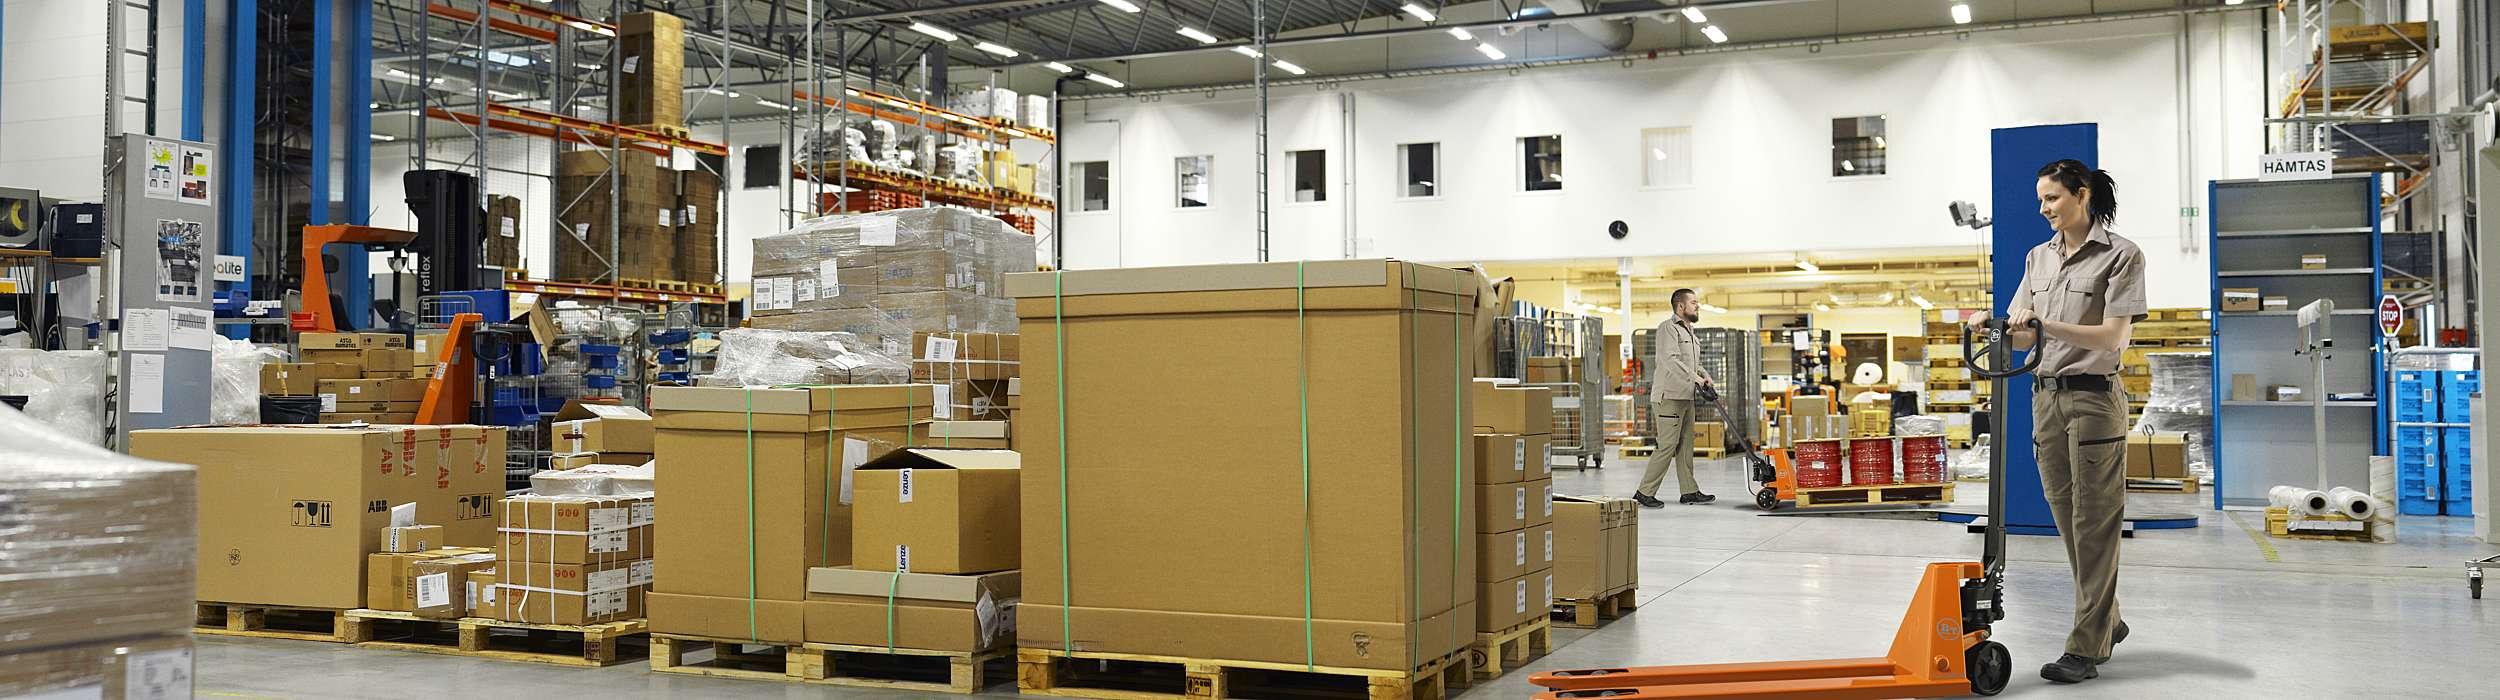 Hand pallet truck in warehouse